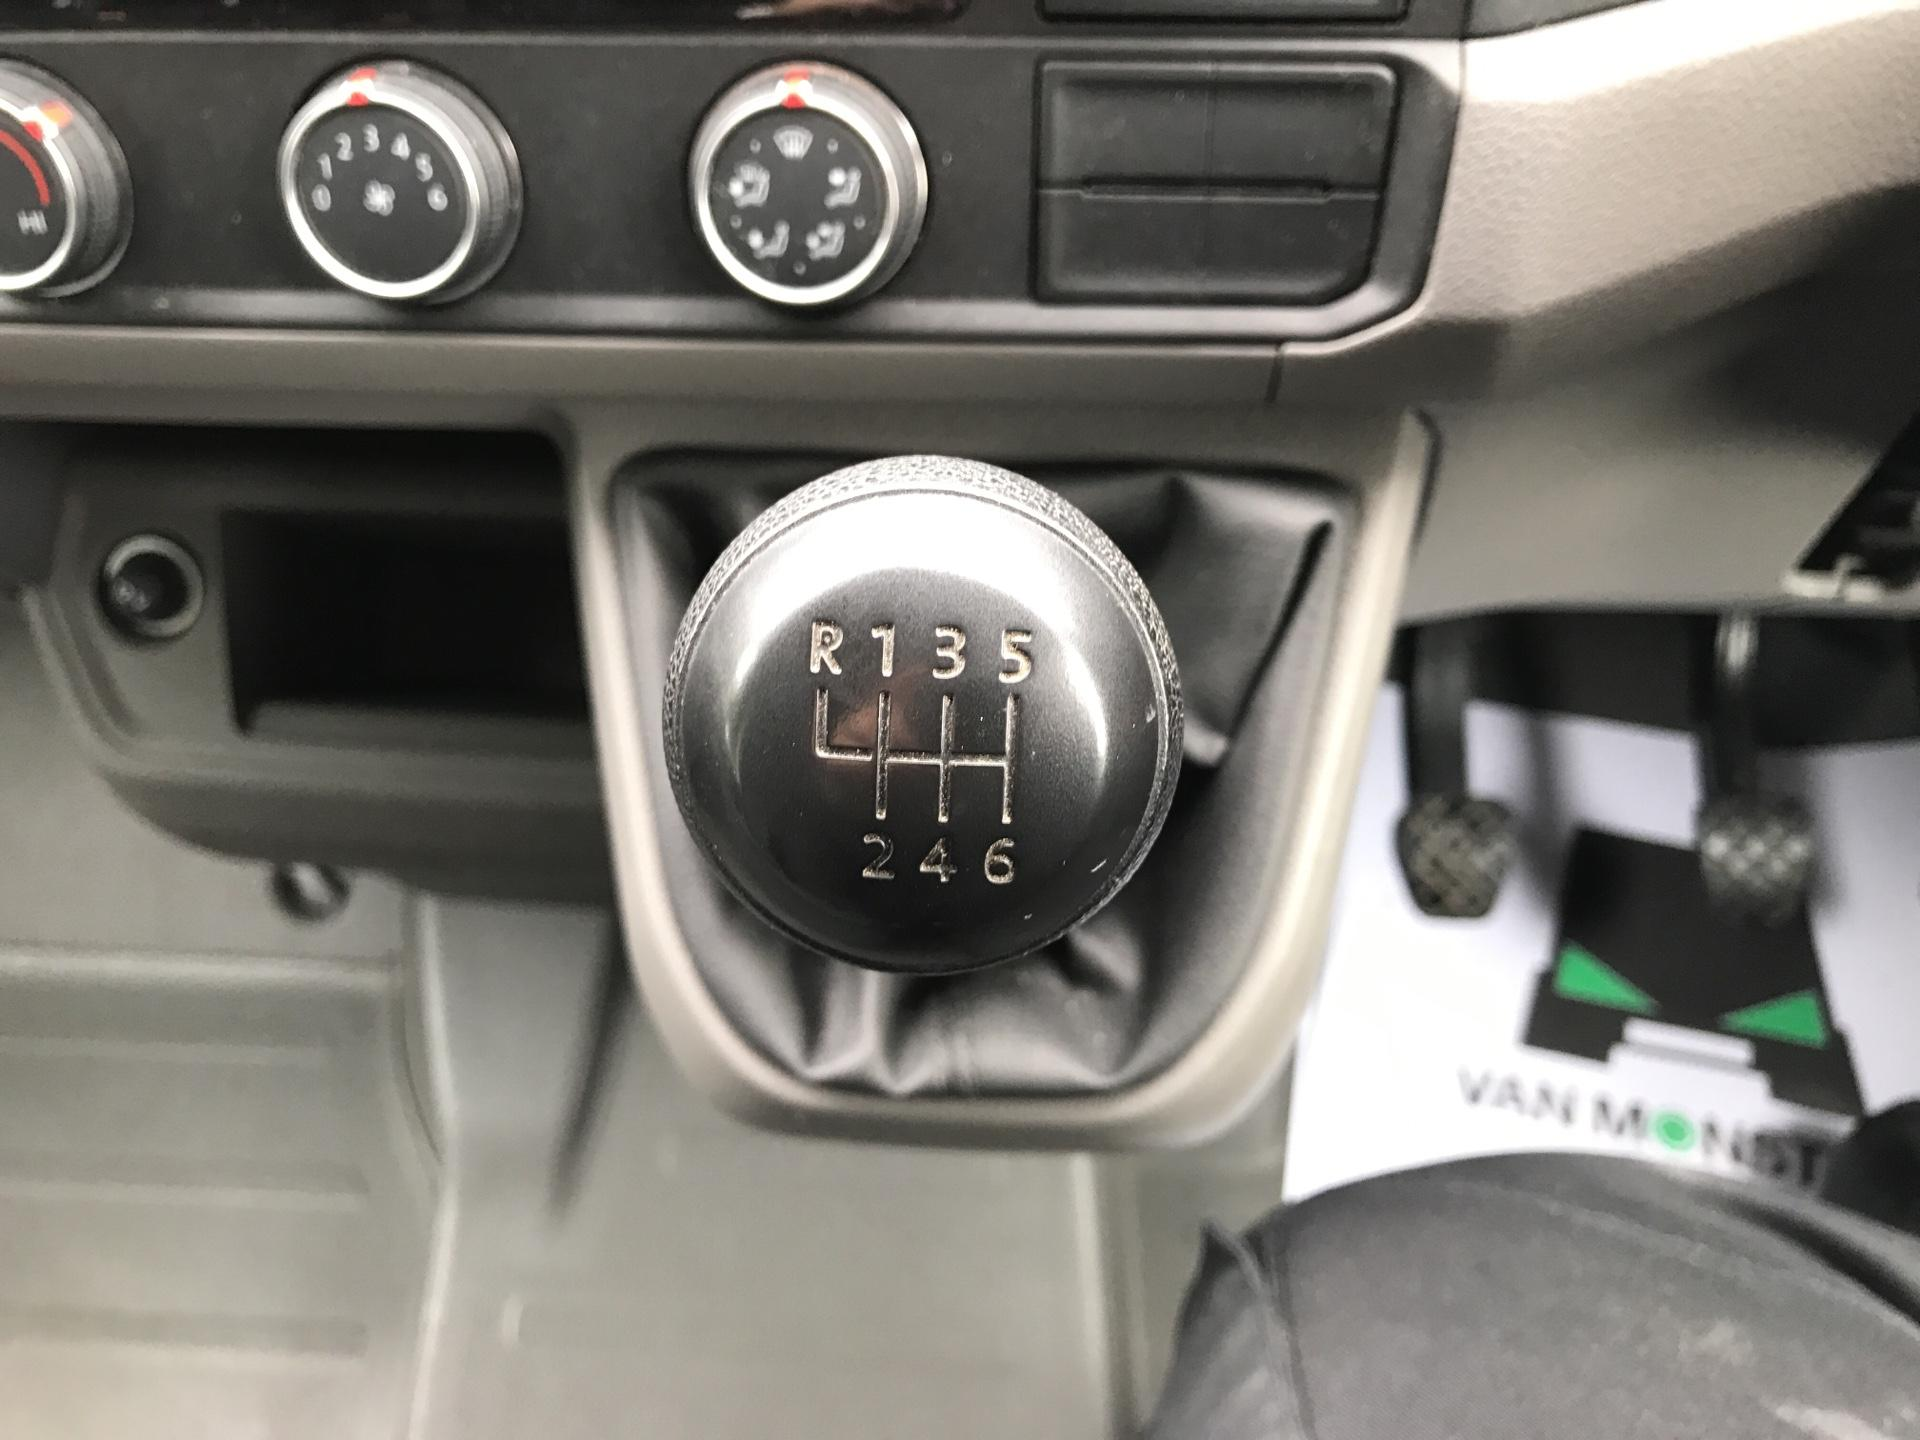 2017 Volkswagen Crafter CR35 LWB DIESEL 2.0 TDI 140PS TRENDLINE HIGH ROOF EURO 6 (YG67ZVA) Image 11